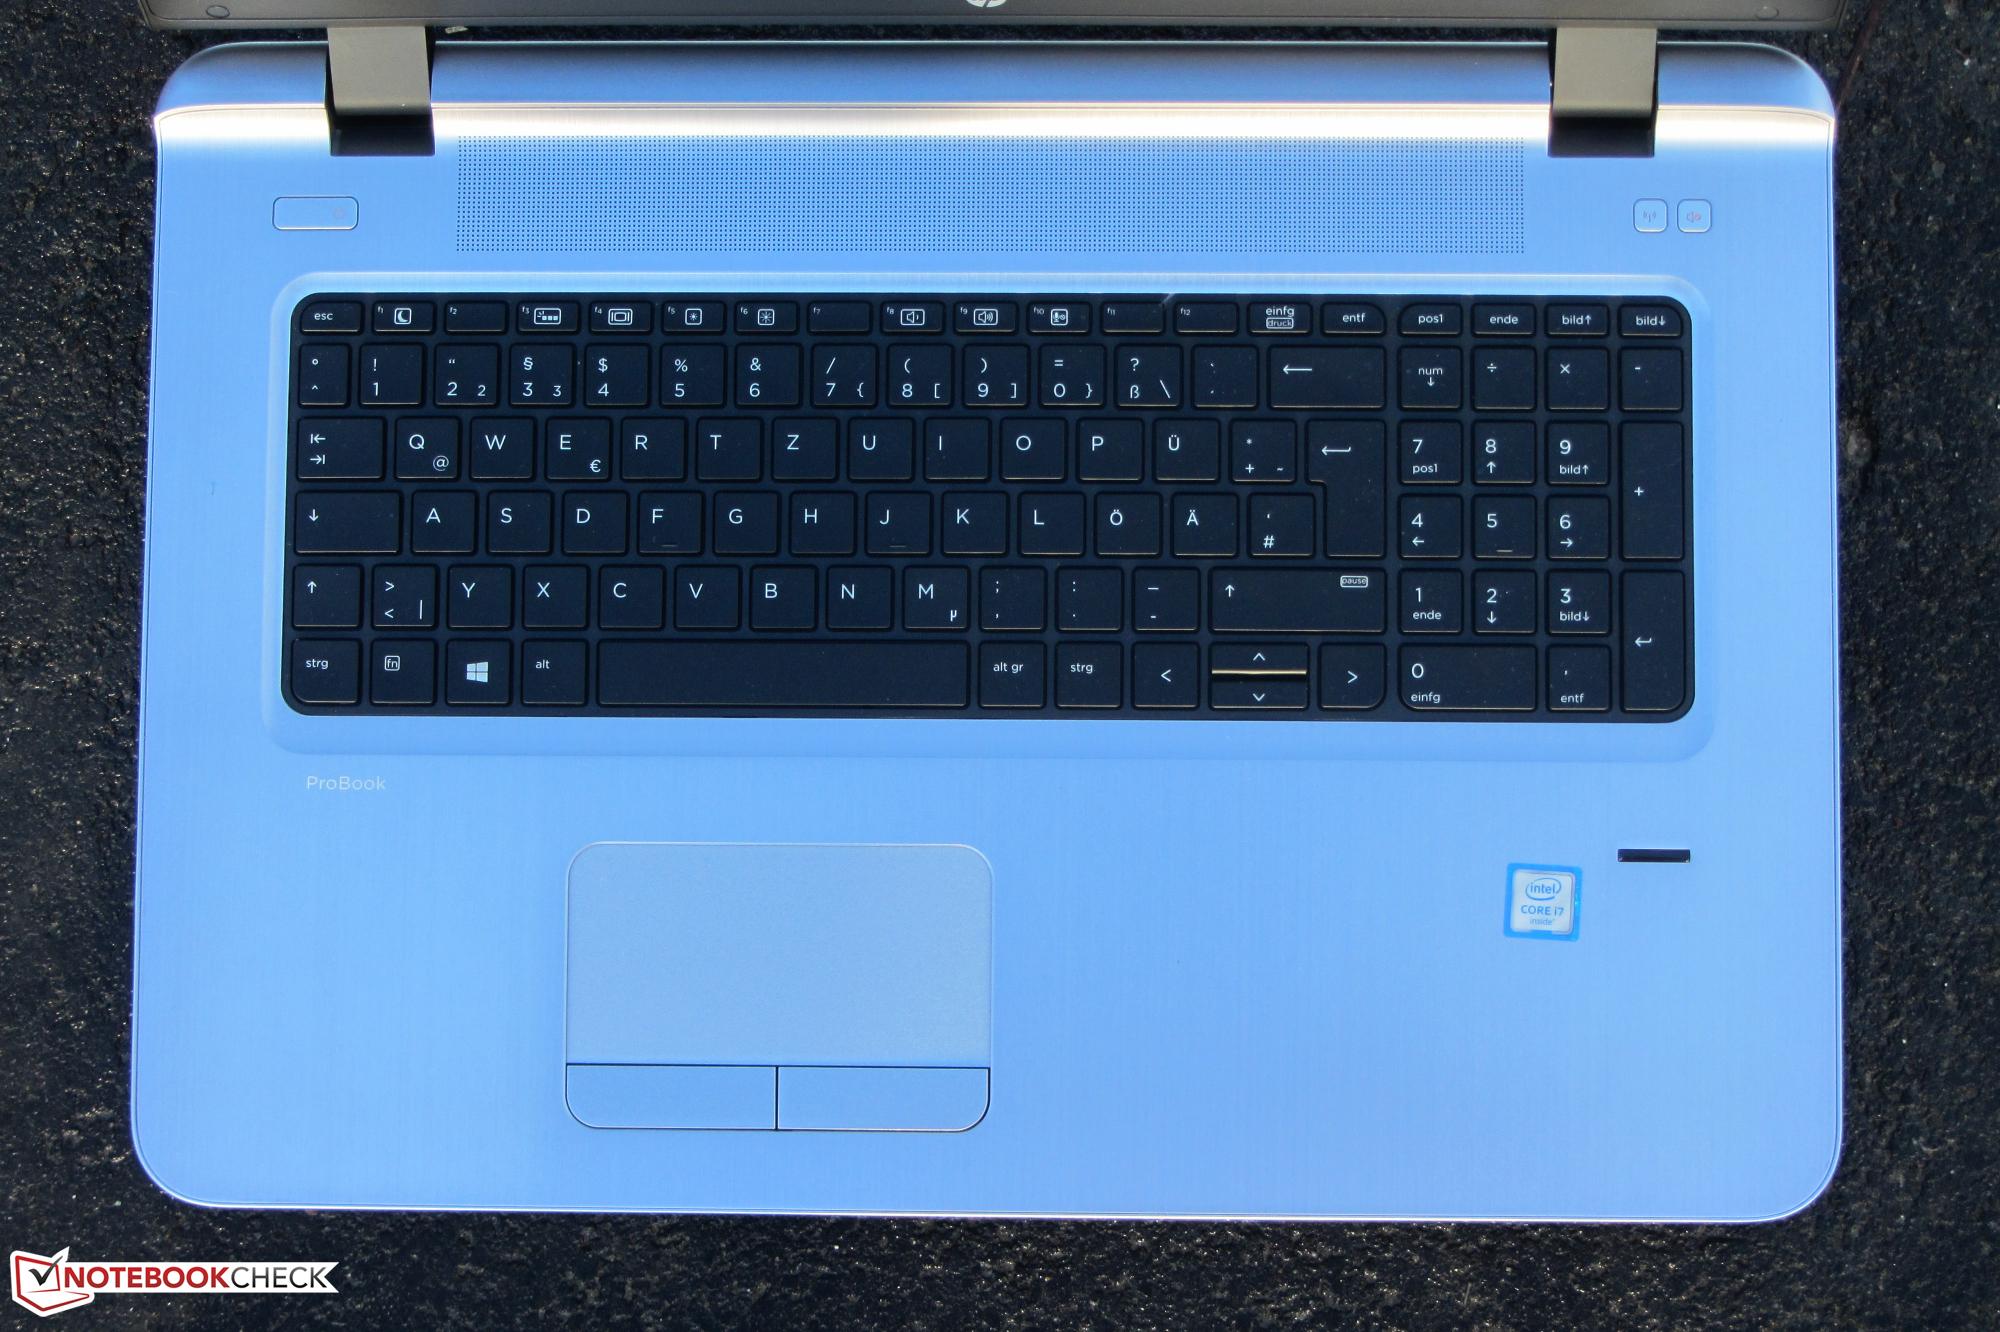 HP ProBook 470 G3 (Core i7-6500U, Radeon R7 M340) Notebook